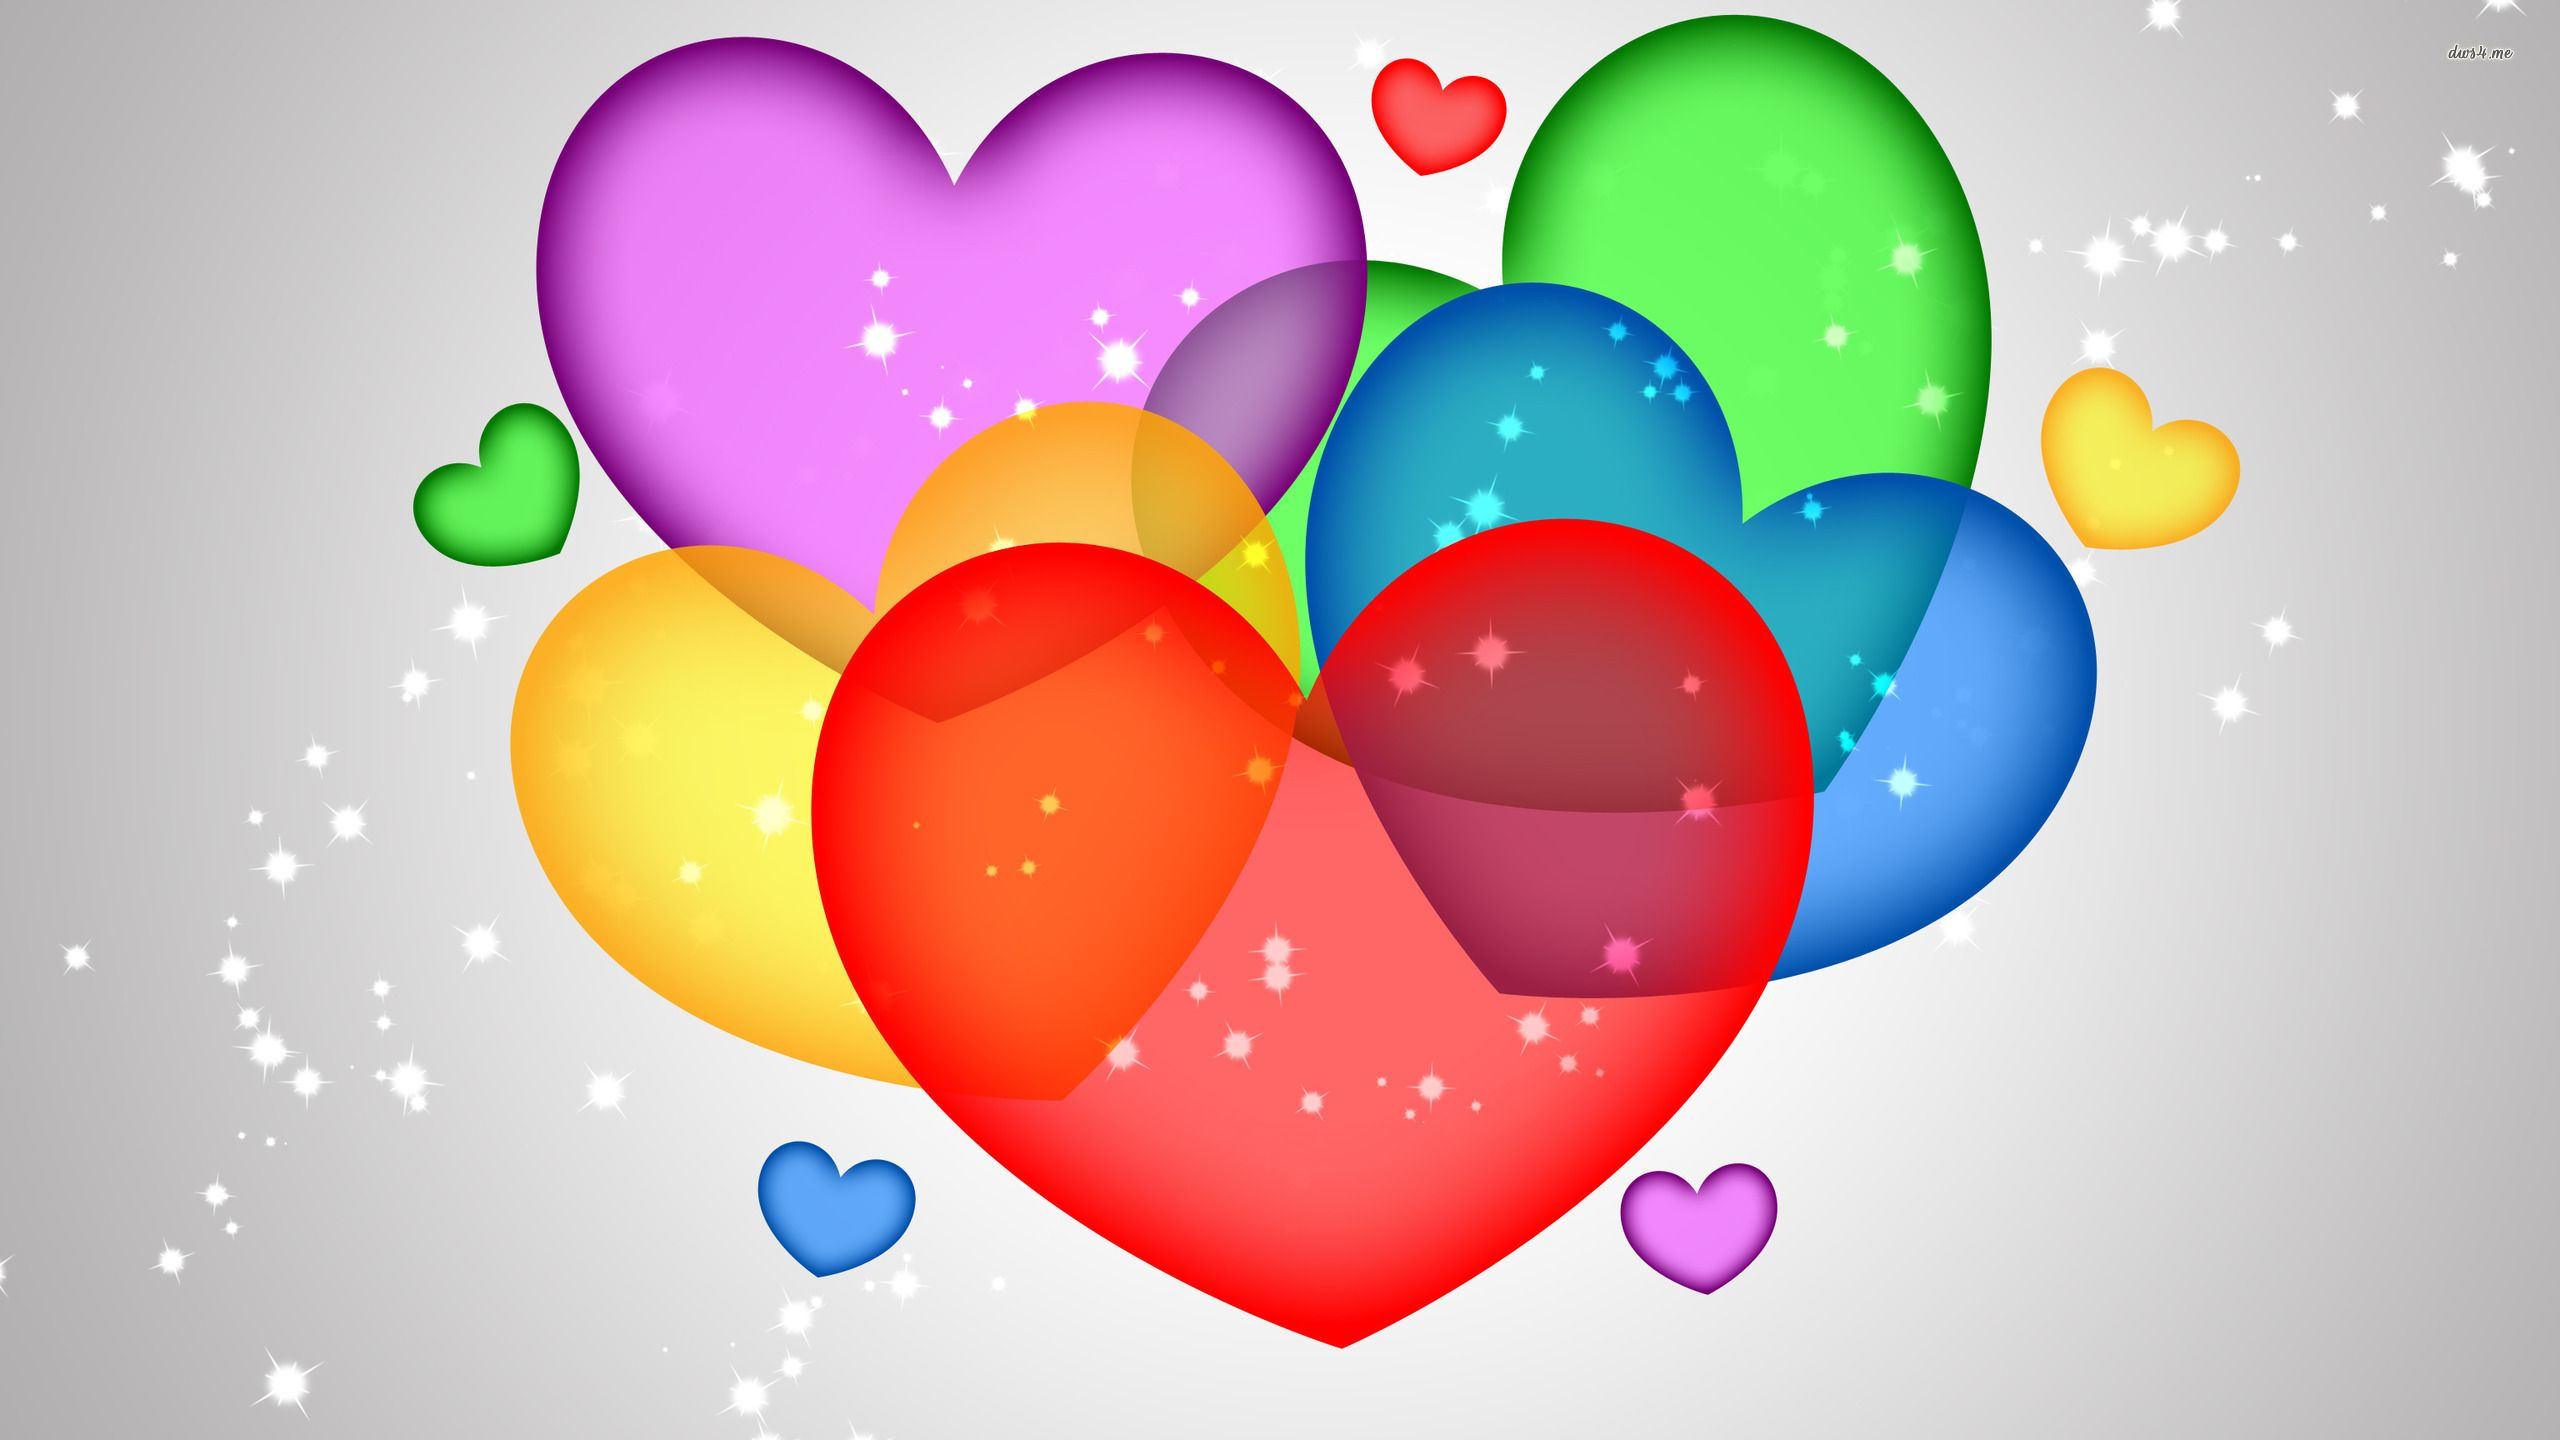 30 Beautiful Love & Heart Wallpapers